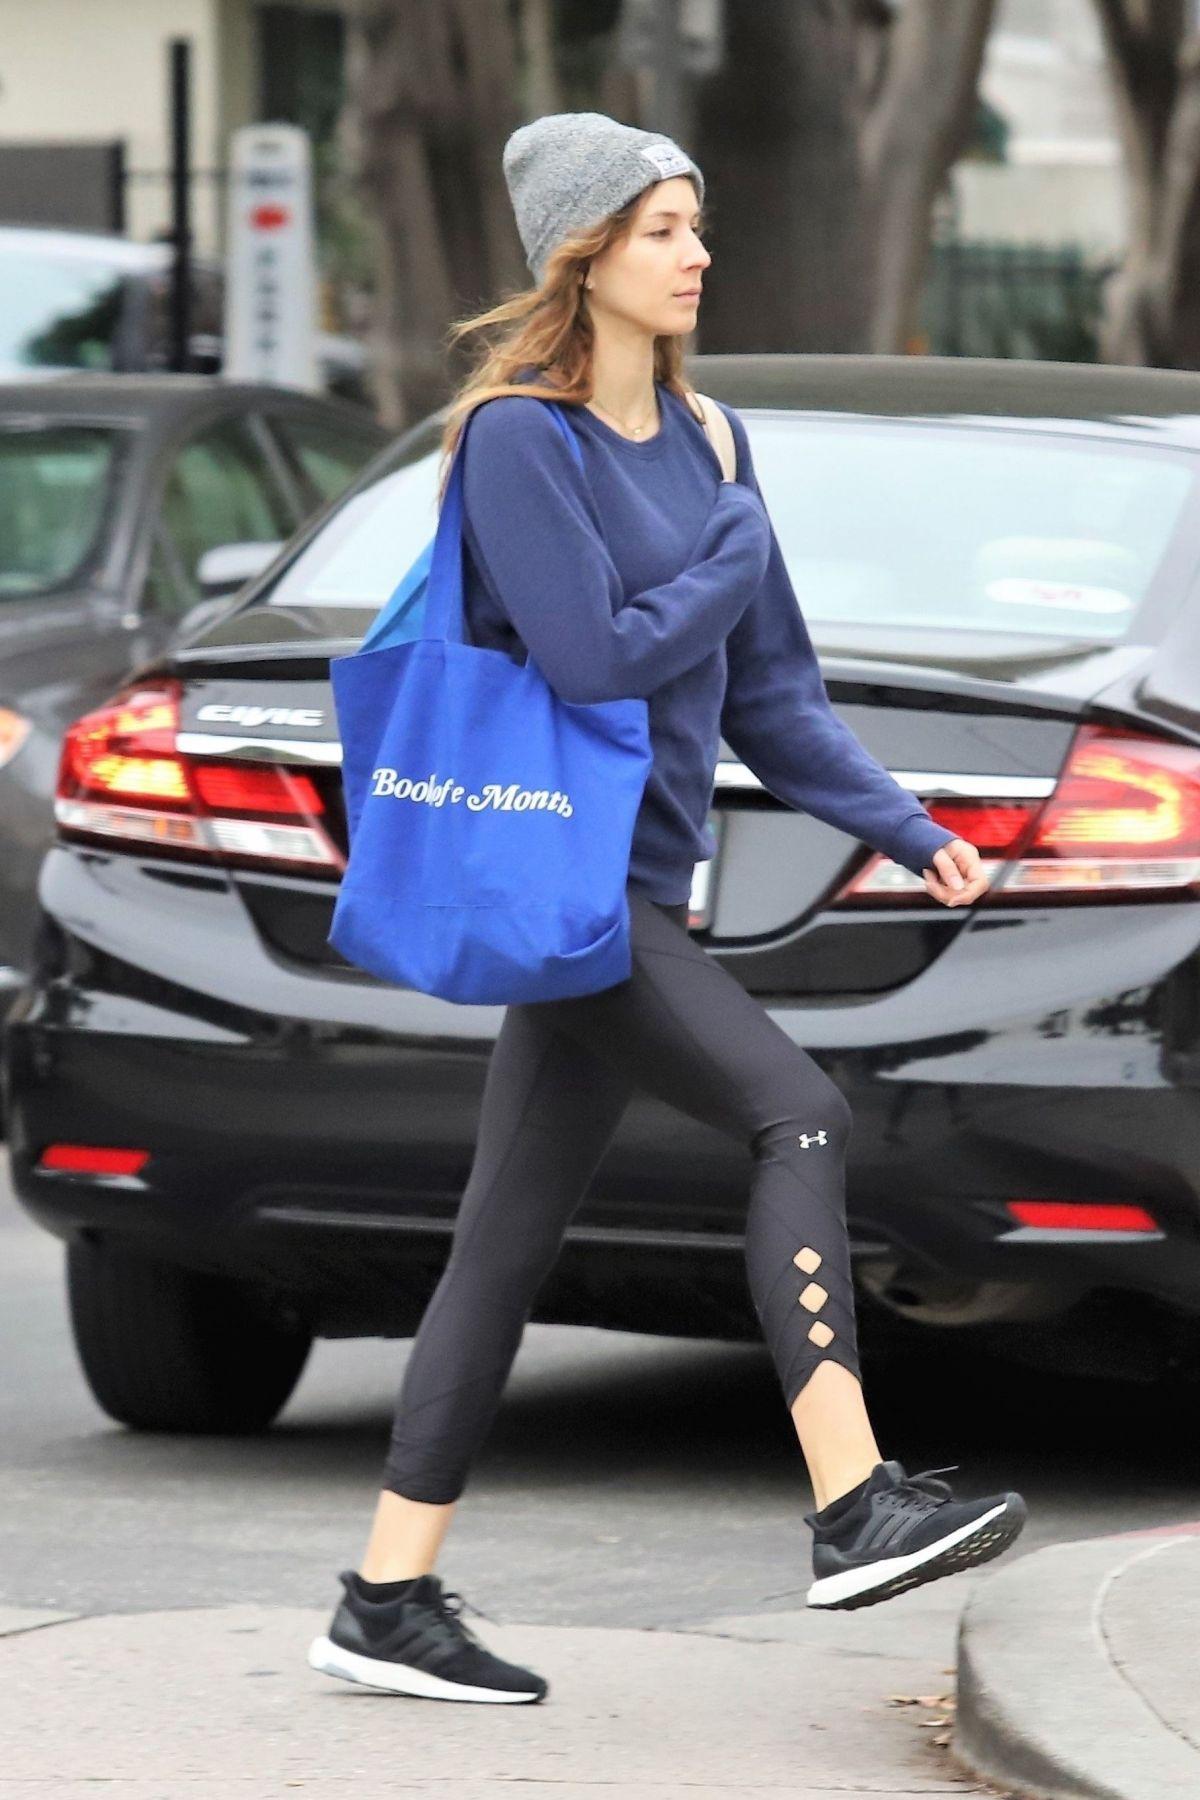 TROIAN BELLISARIO Out Shopping in Los Angeles 01/05/2019 ...  TROIAN BELLISAR...